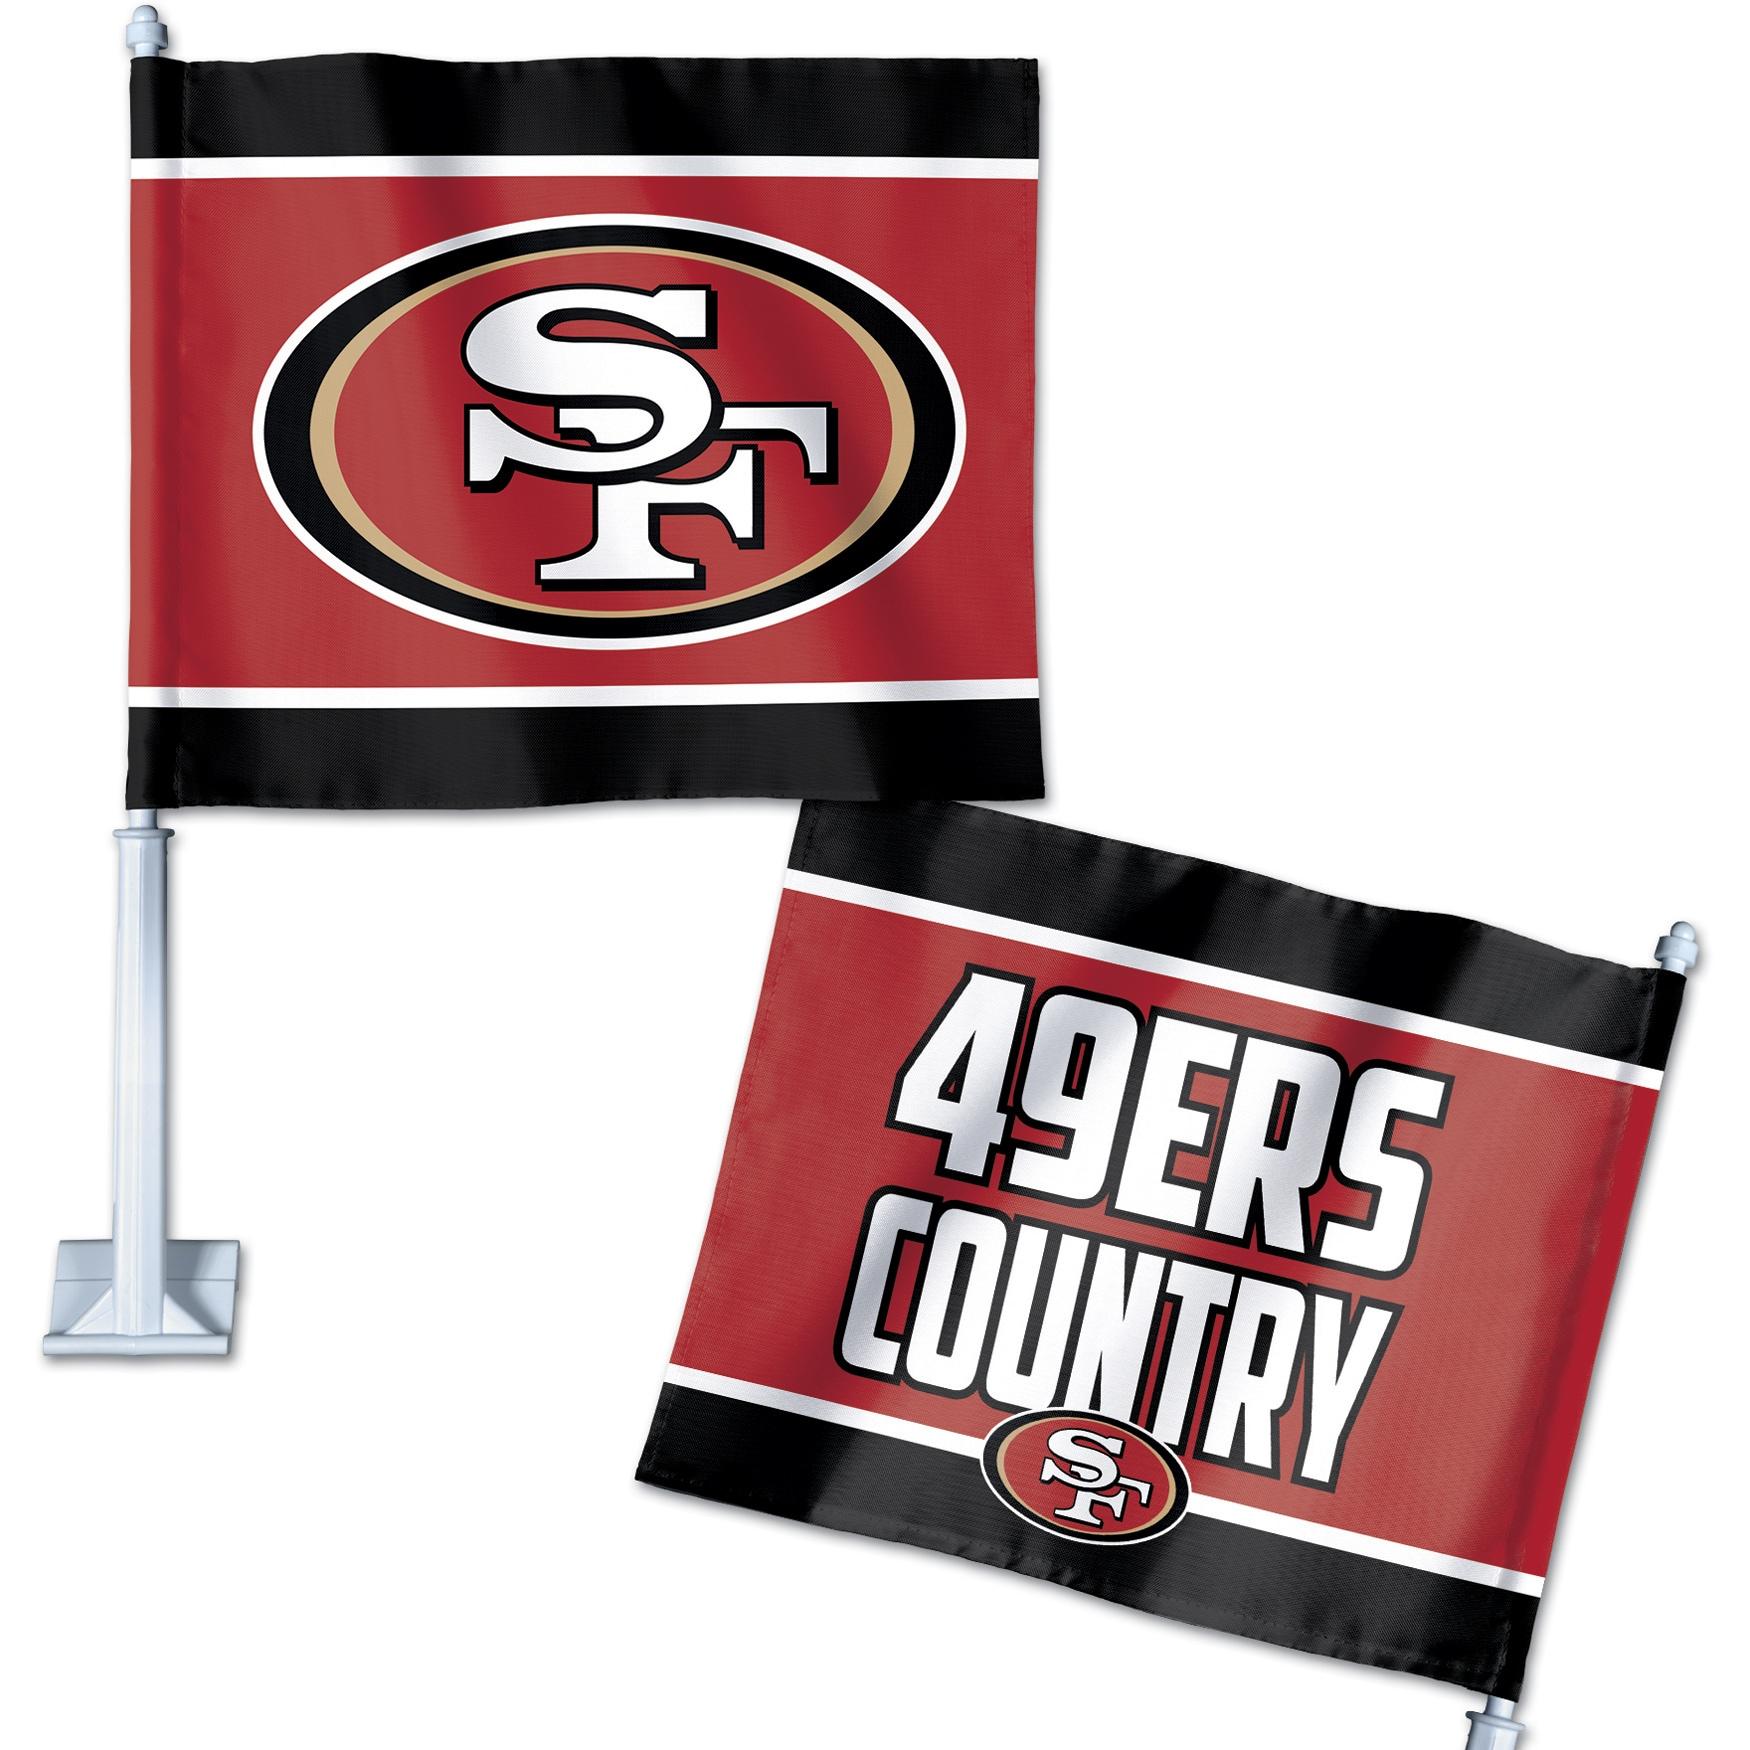 San Francisco 49ers WinCraft Double-Sided Slogan Car Flag